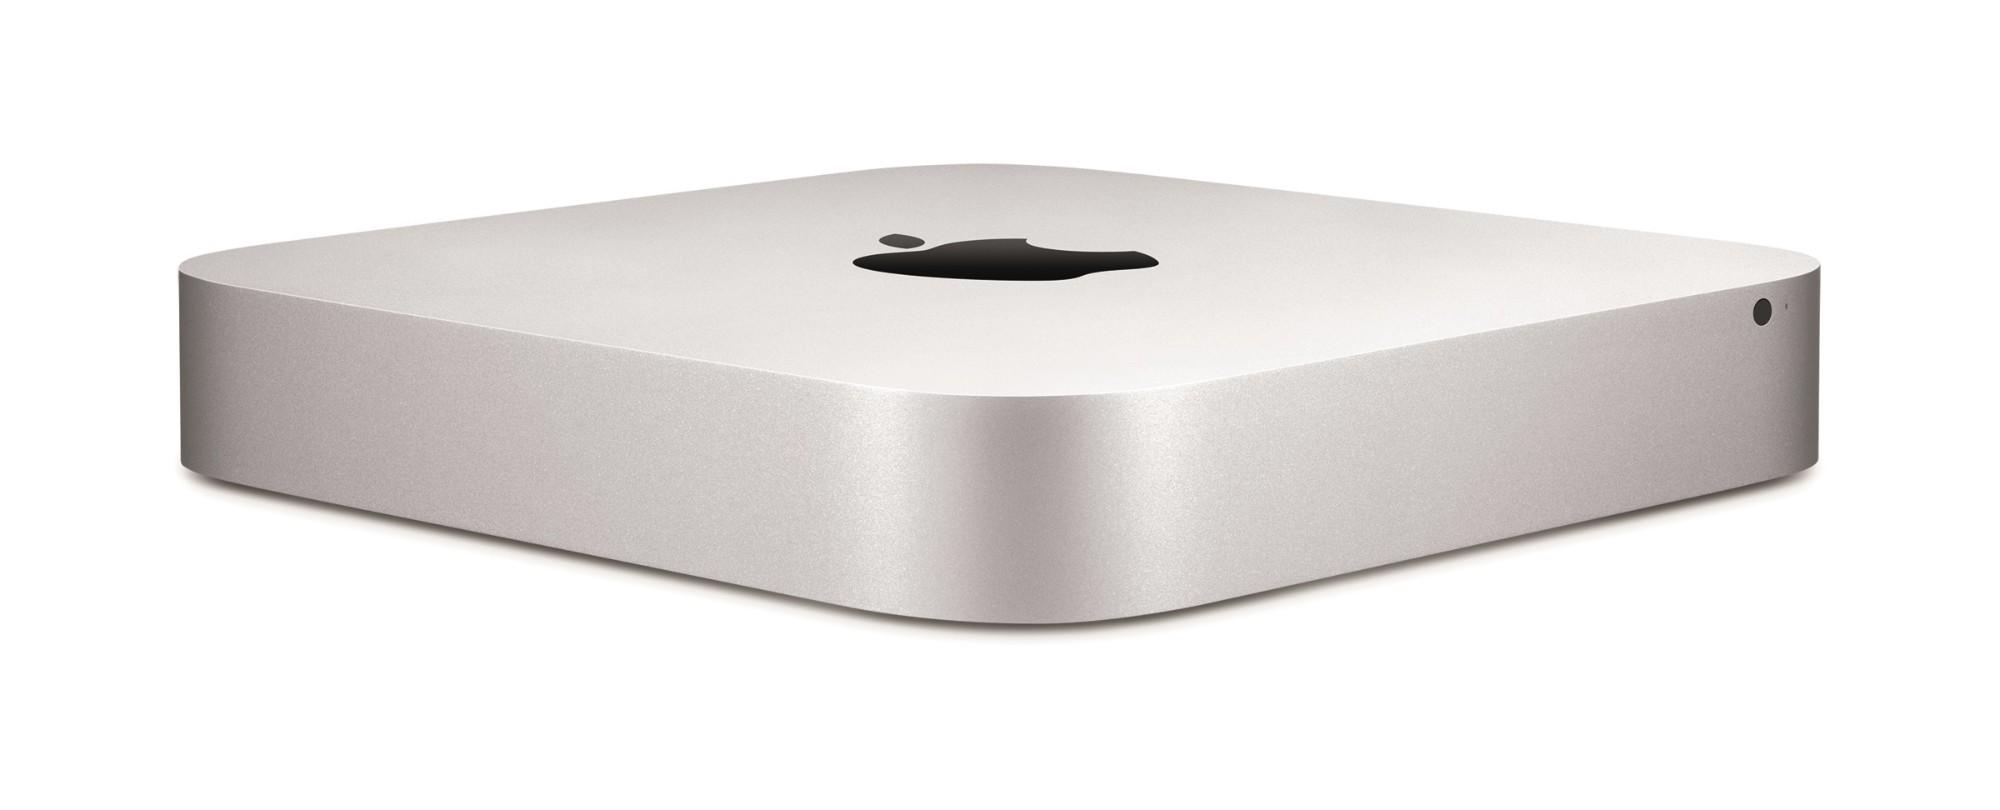 Apple Mac mini 2.6GHz 2.6GHz Nettop Silver